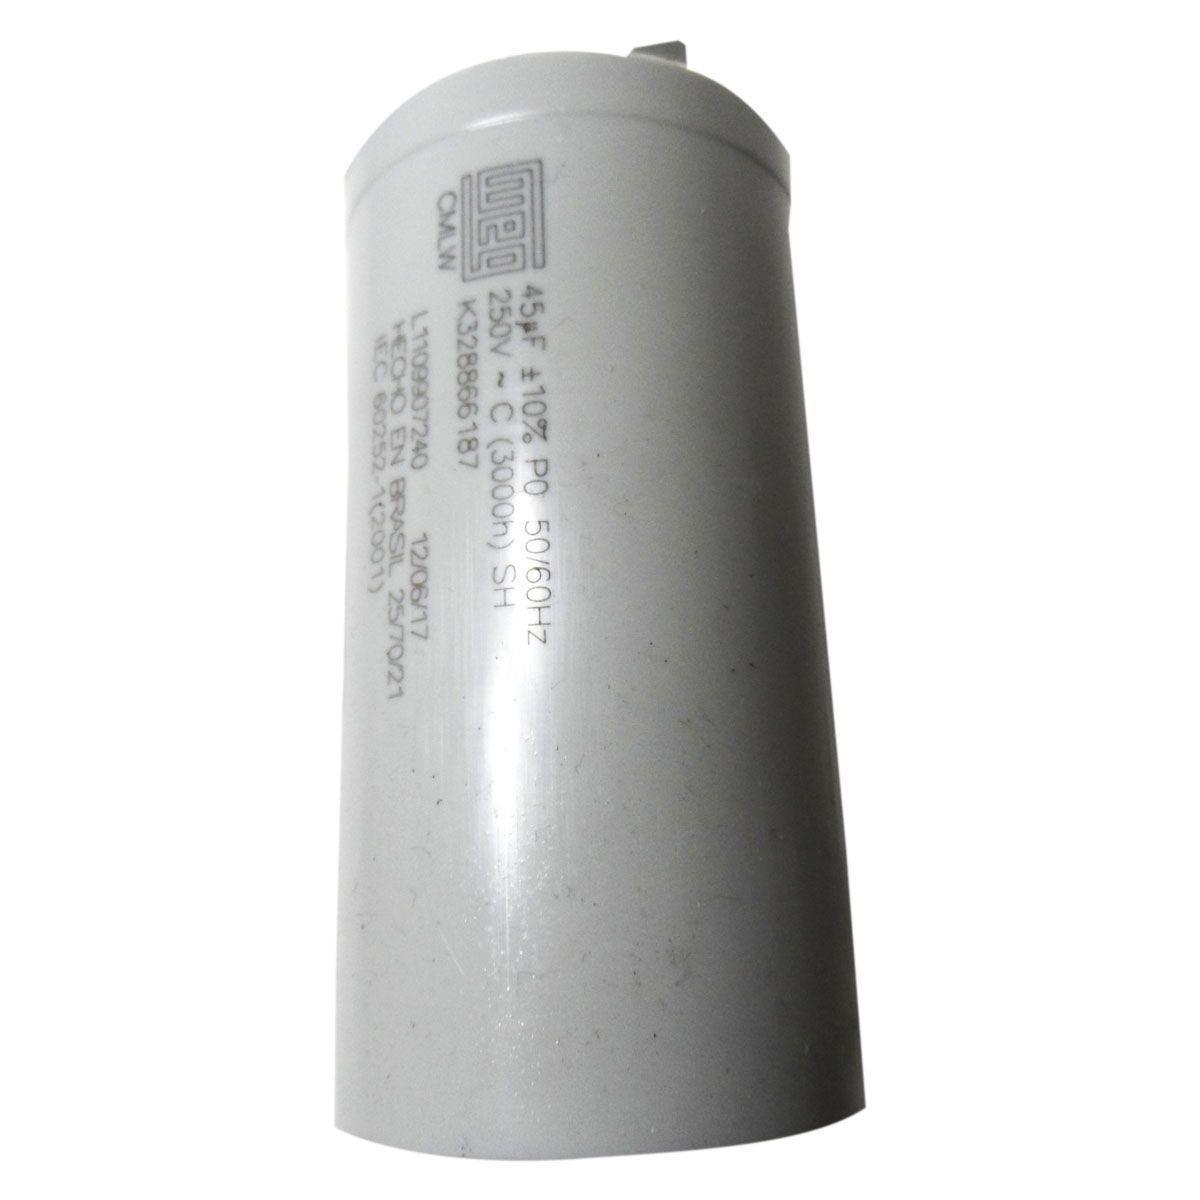 CAPACITOR 45MF LAVADORA BRASTEMP CONSUL ELETRÔNICA/MONDIAL 326066187